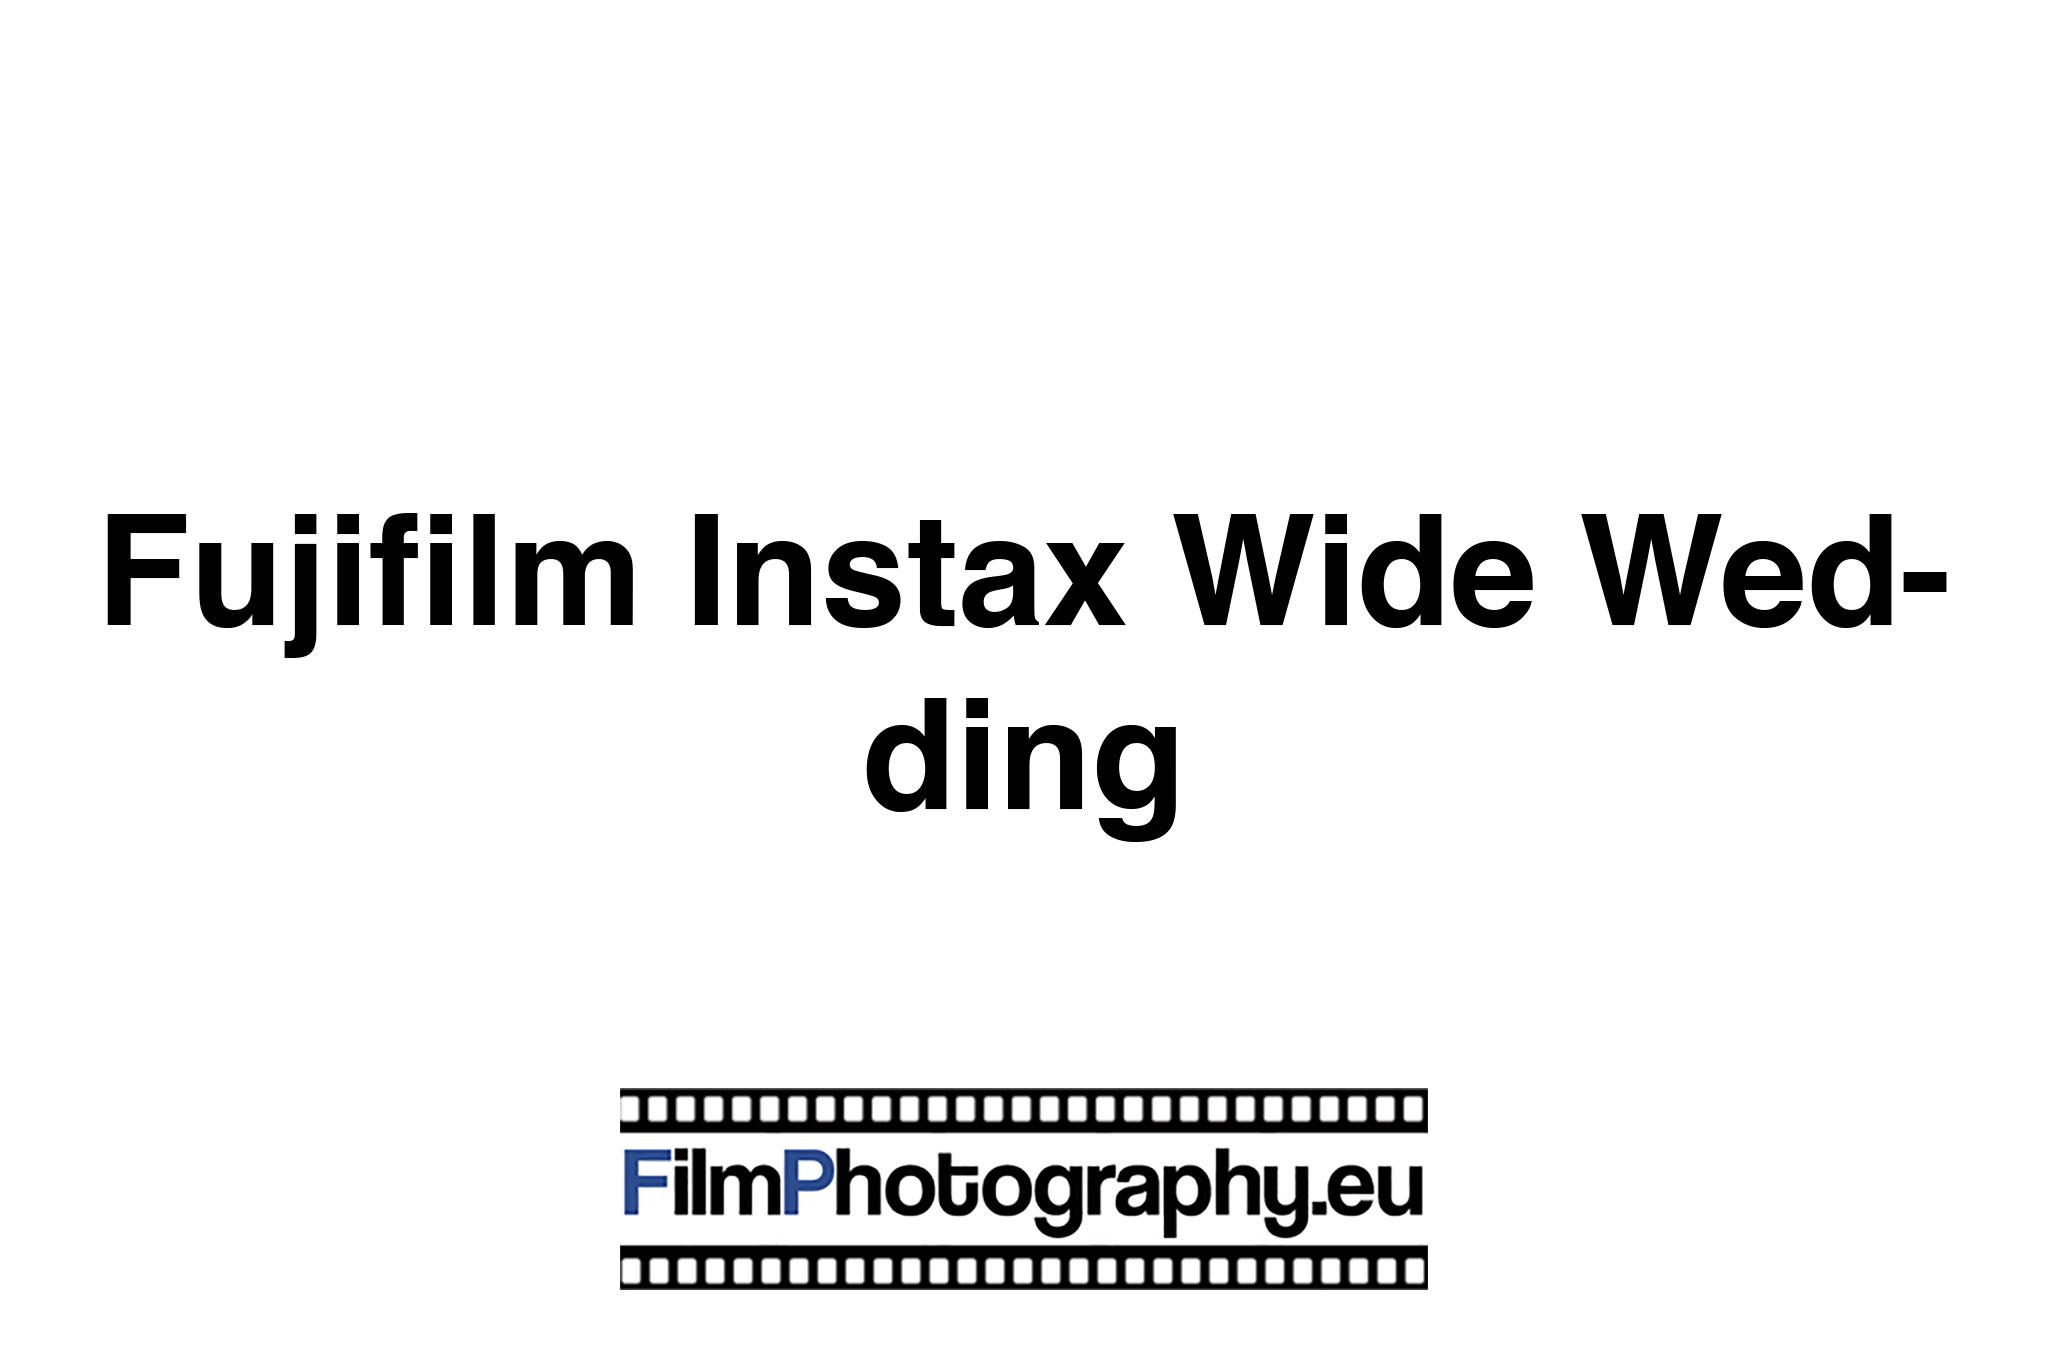 Fujifilm Instax Wide Wedding Sofortbildfilm